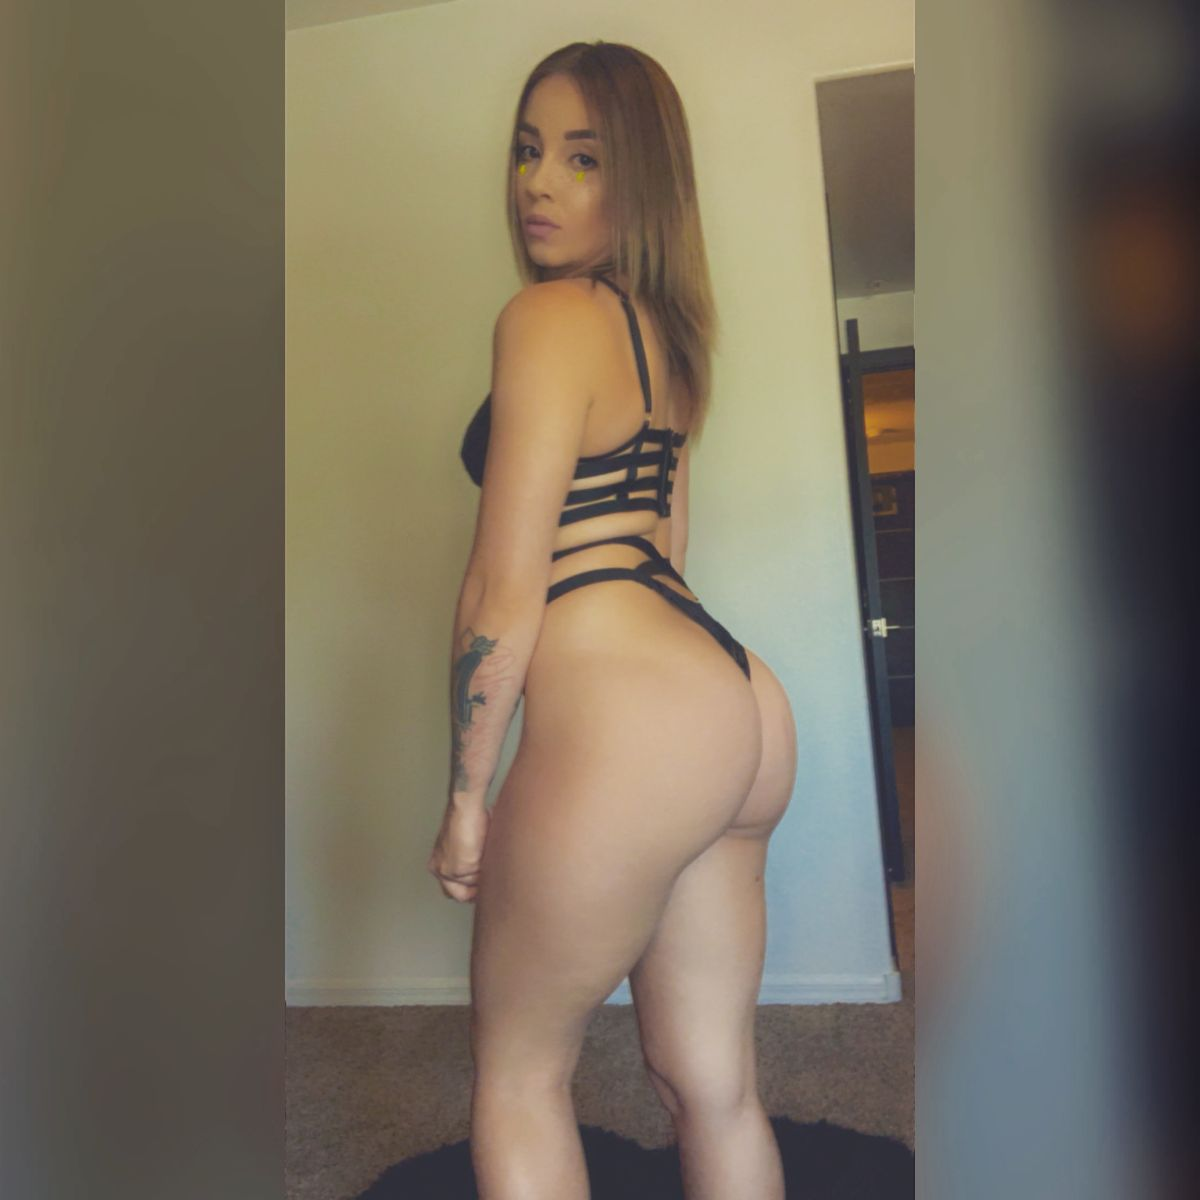 Free nudes of Jordan Sparxx onlyfans leaked